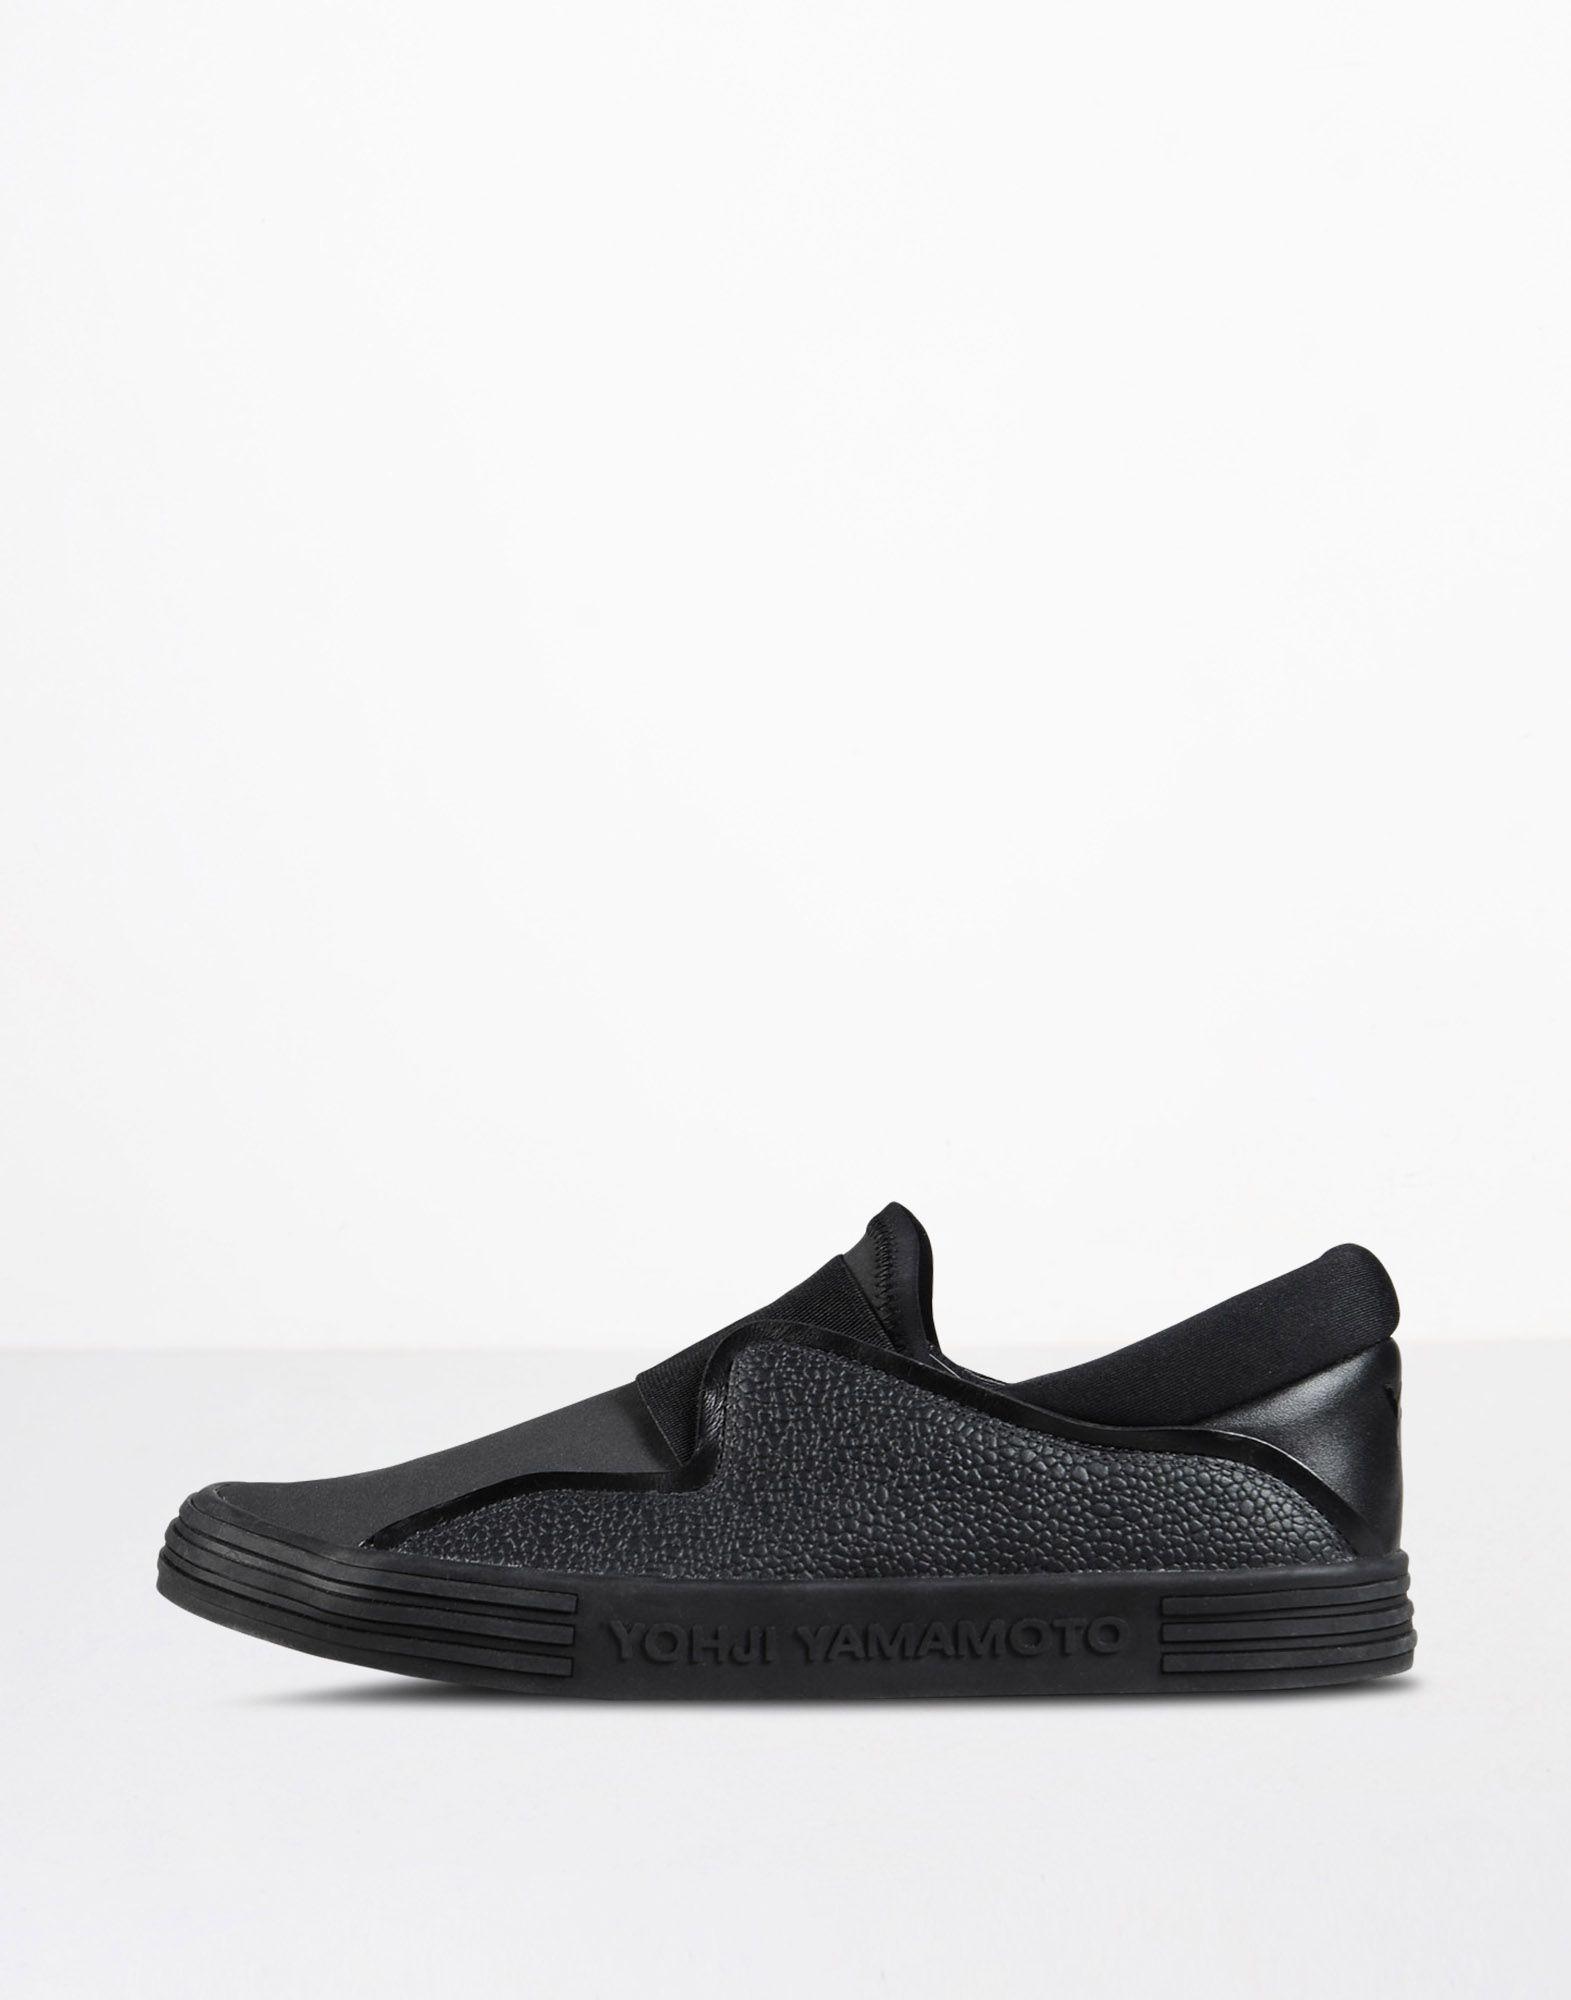 8e03d321564c adidas y 3 slip on aq5381 mens womans shoes black black  y 3 y 3 sunja slip  on sneakers woman